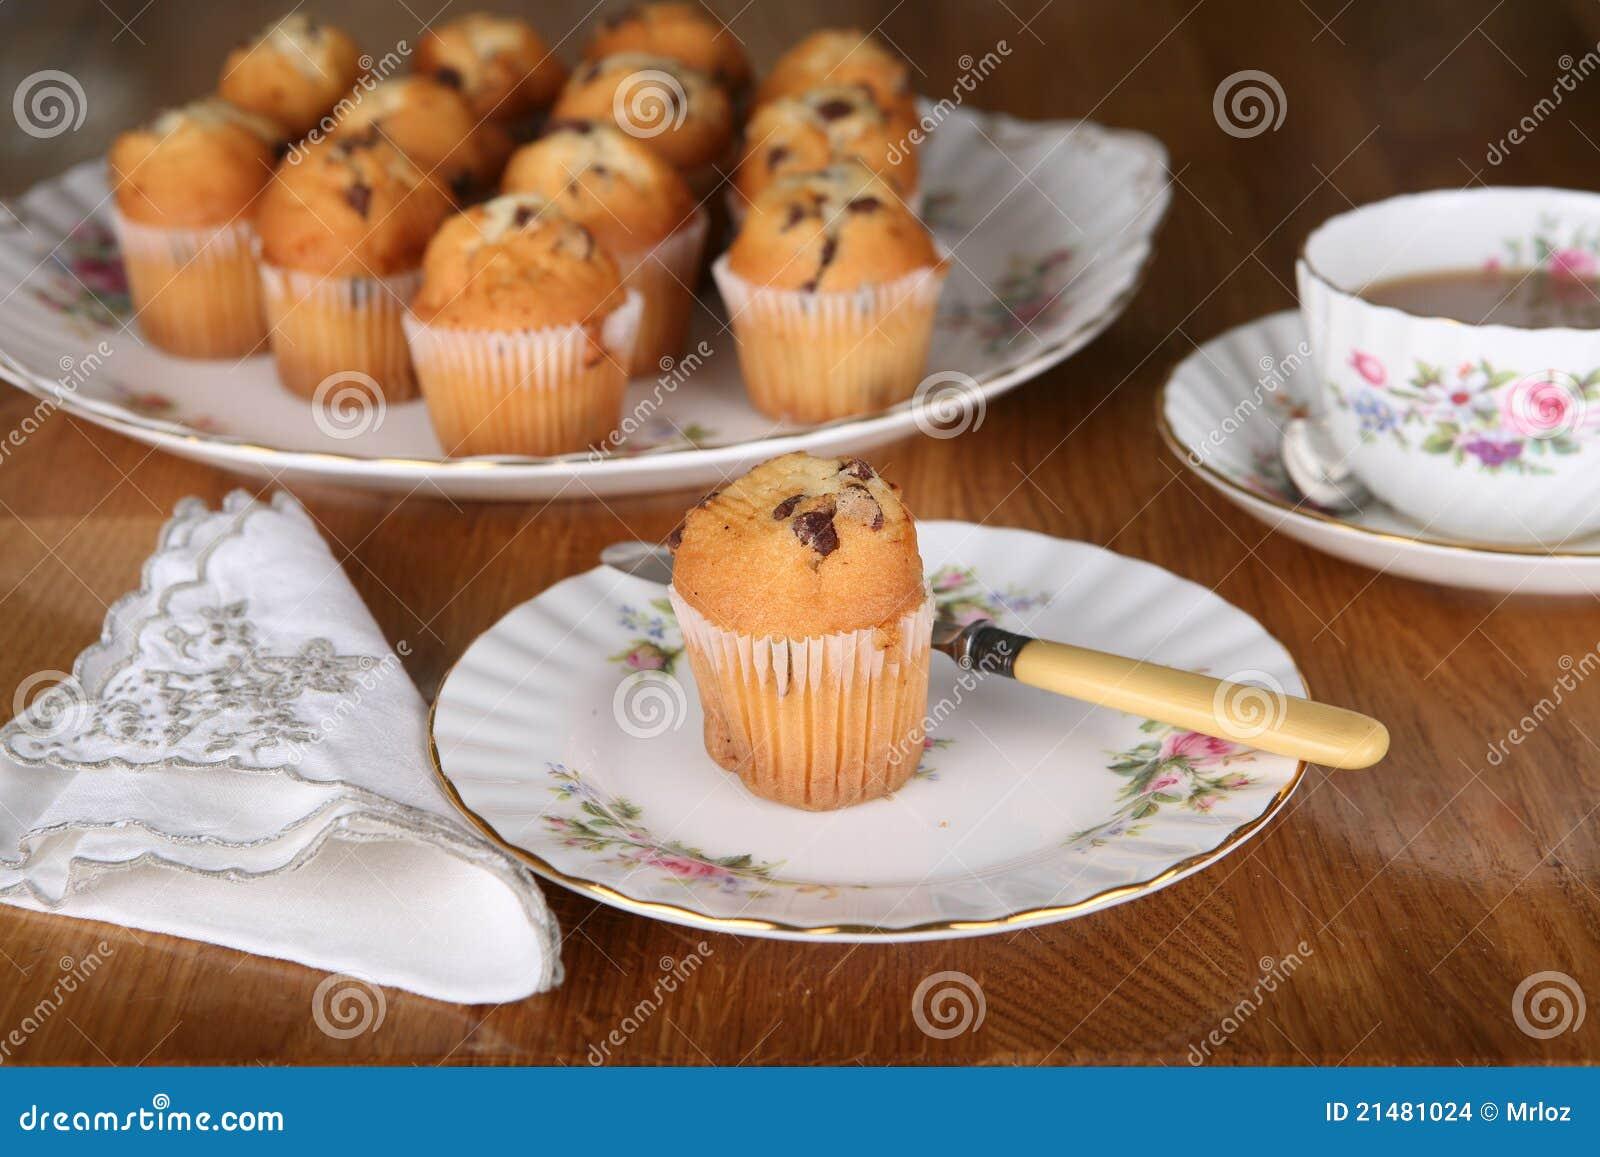 Chocolate Muffin for tea